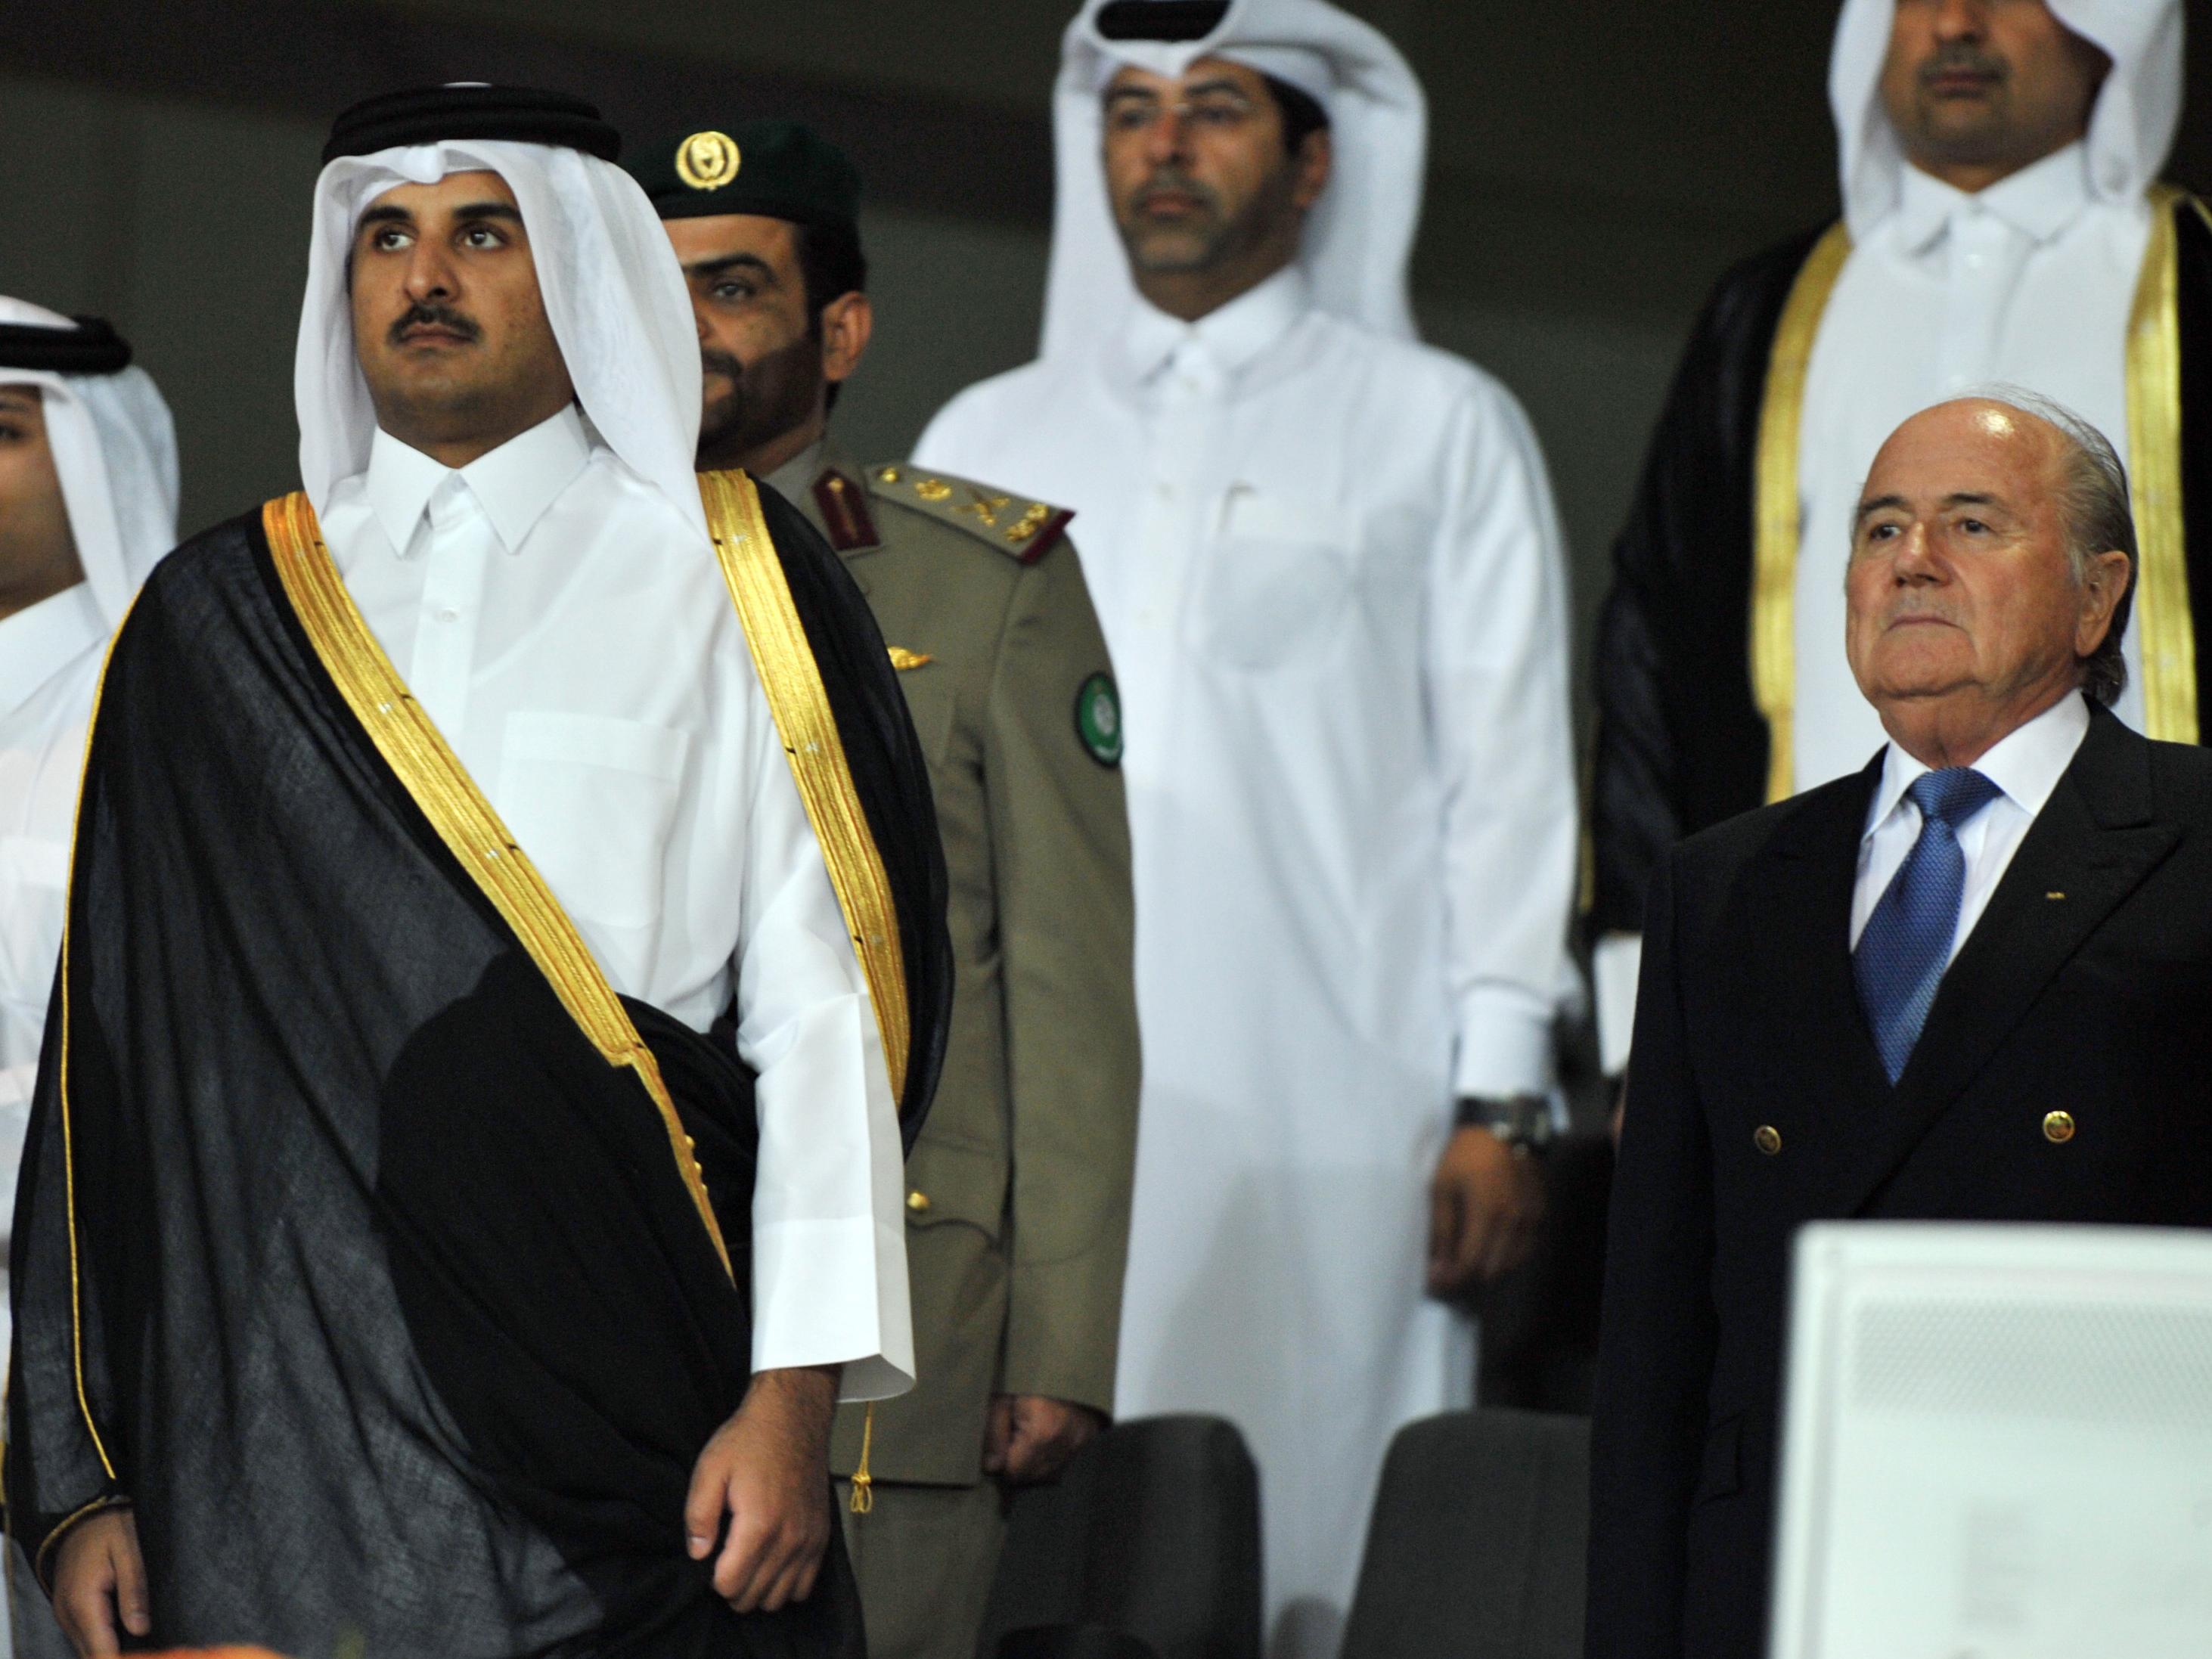 Tamim bin Hamad Al Thani, Sepp Blatter